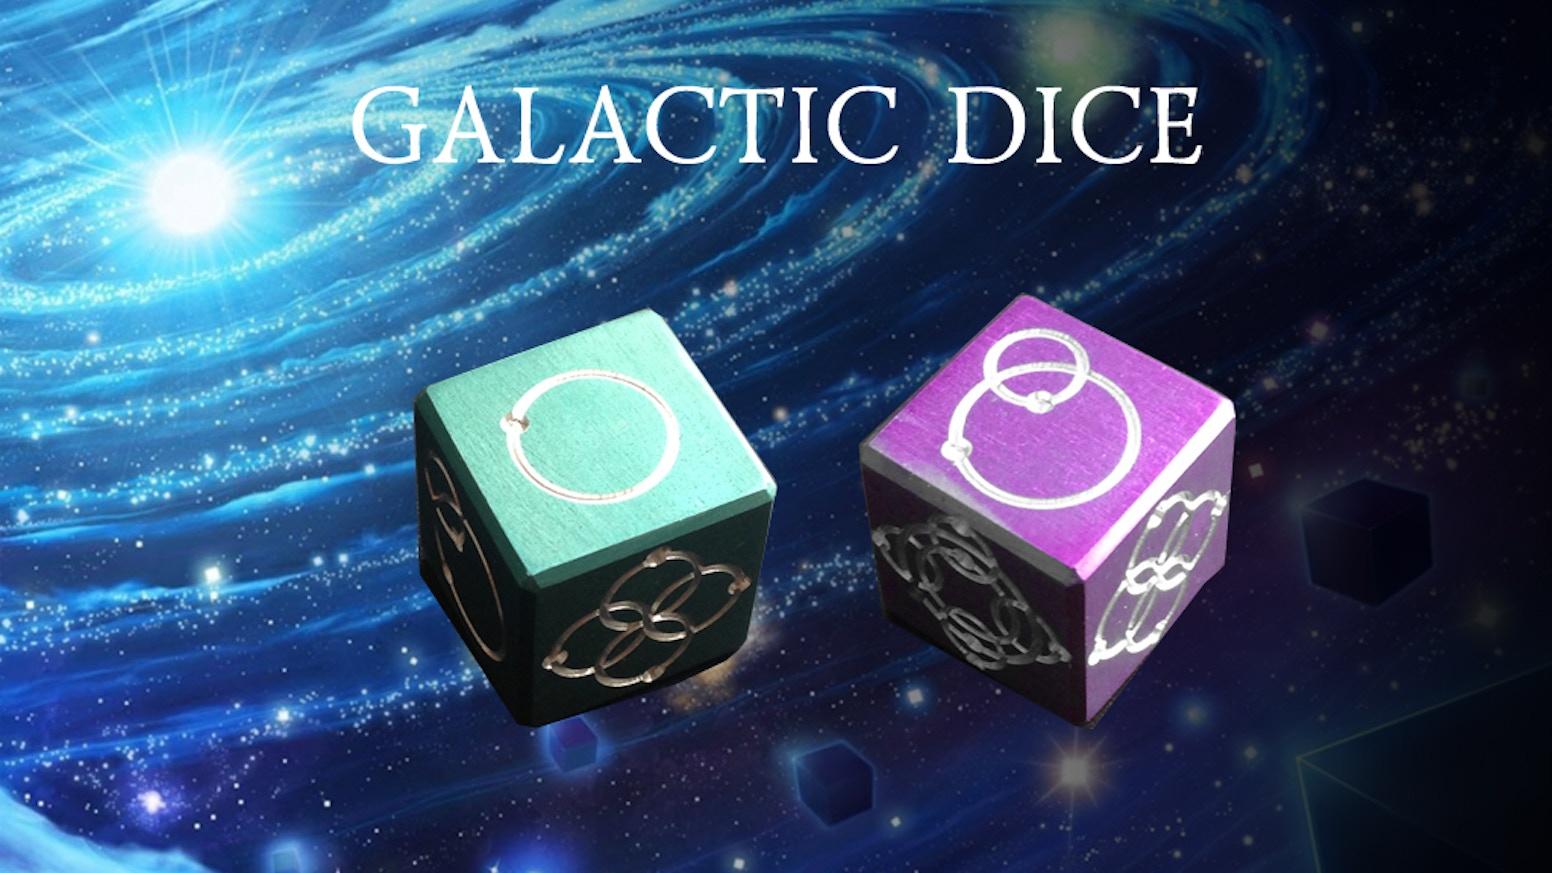 Galactical dice by Kickstarter Stock » Important! Check